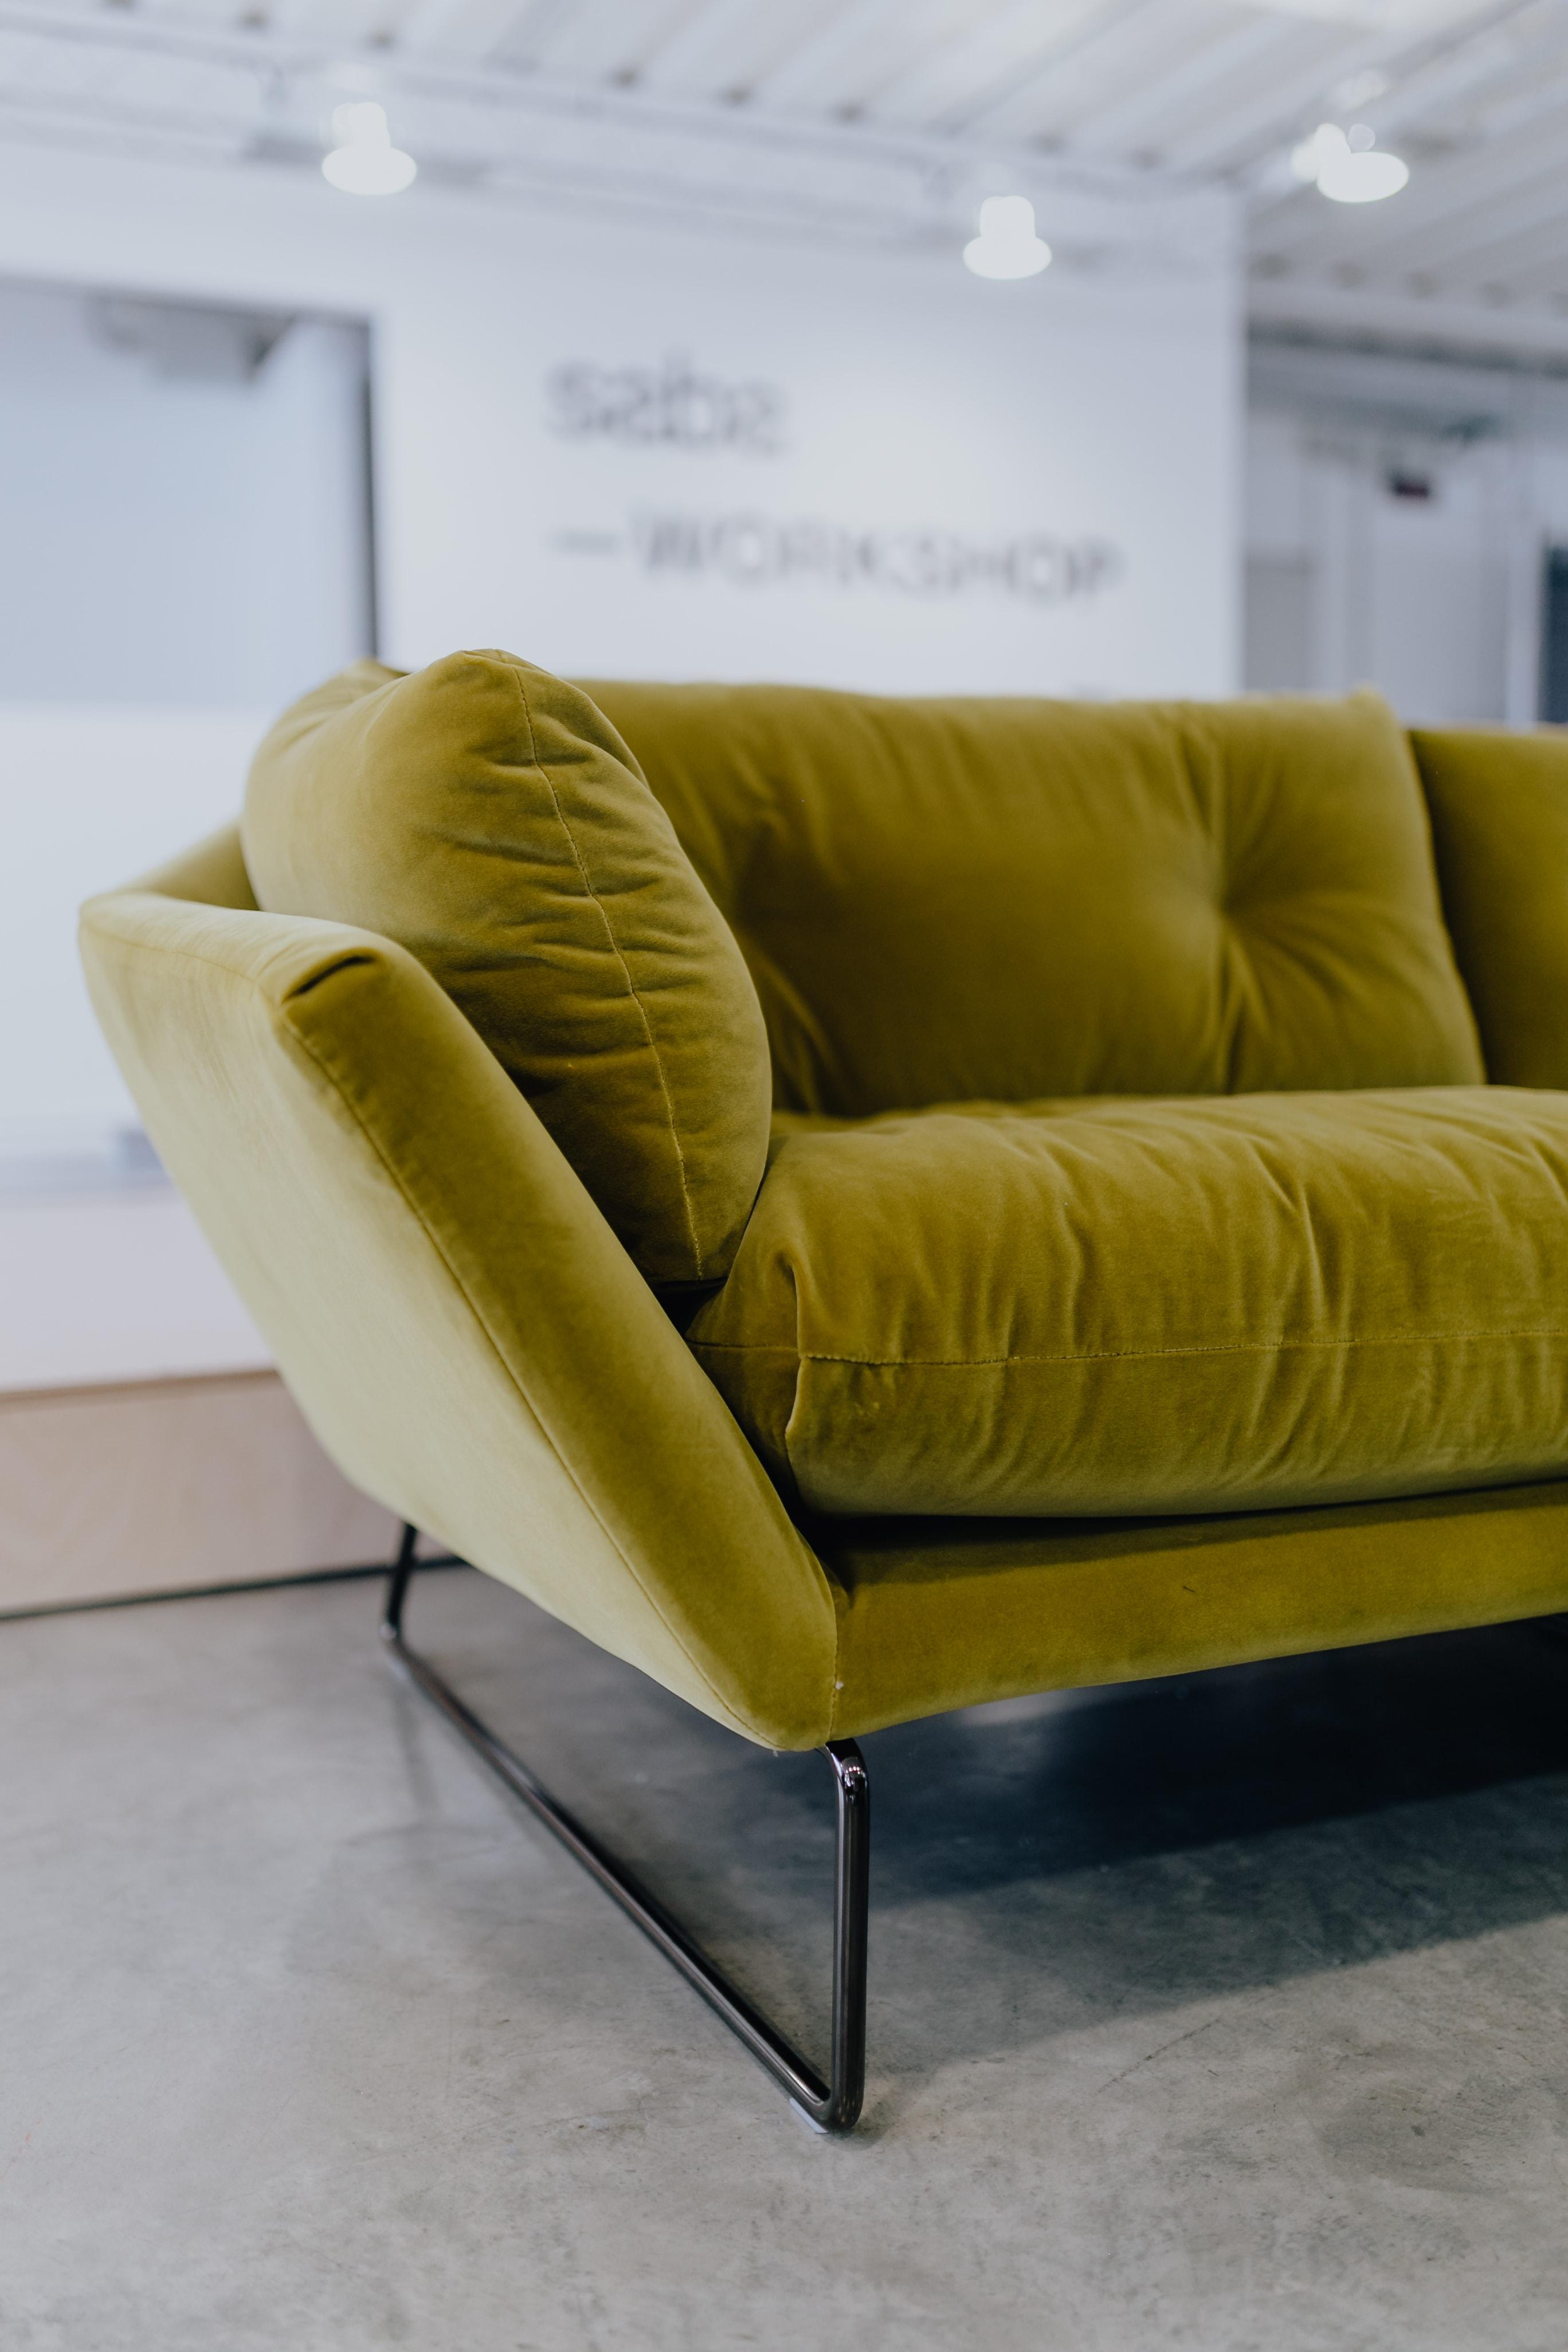 Free stock photos of home decor - Kaboompics